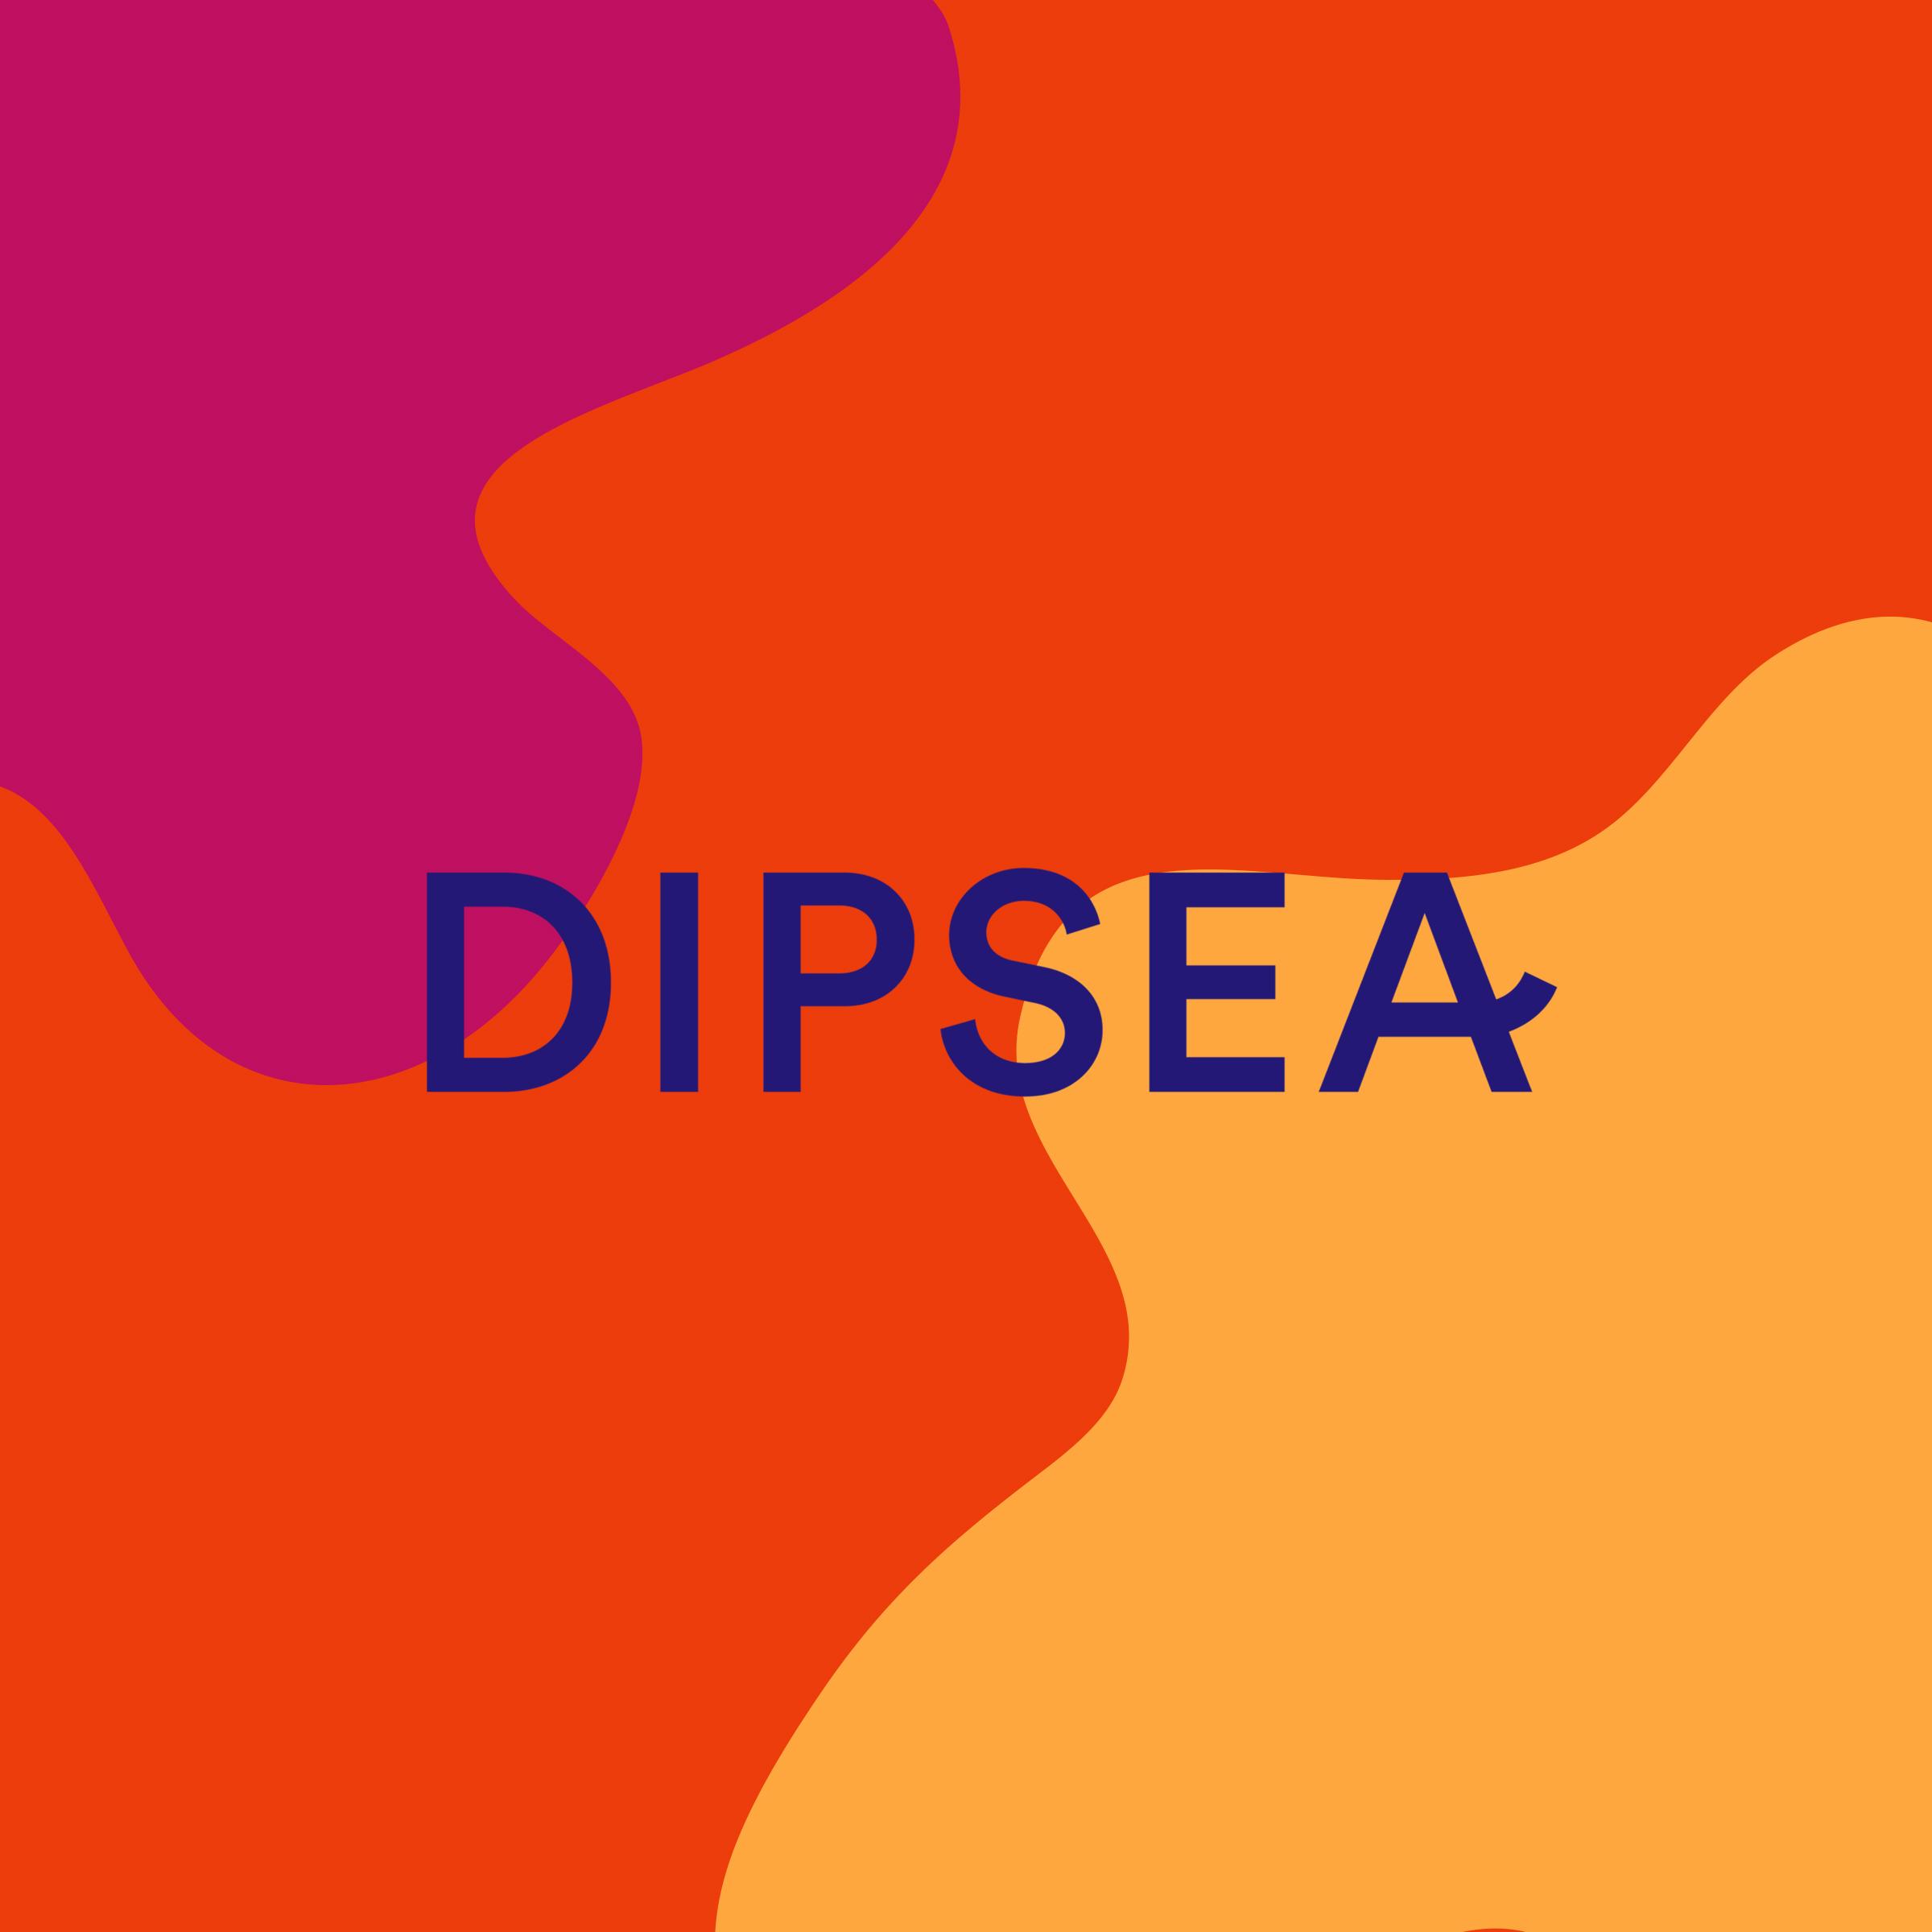 Dispea_Placeholder.jpg